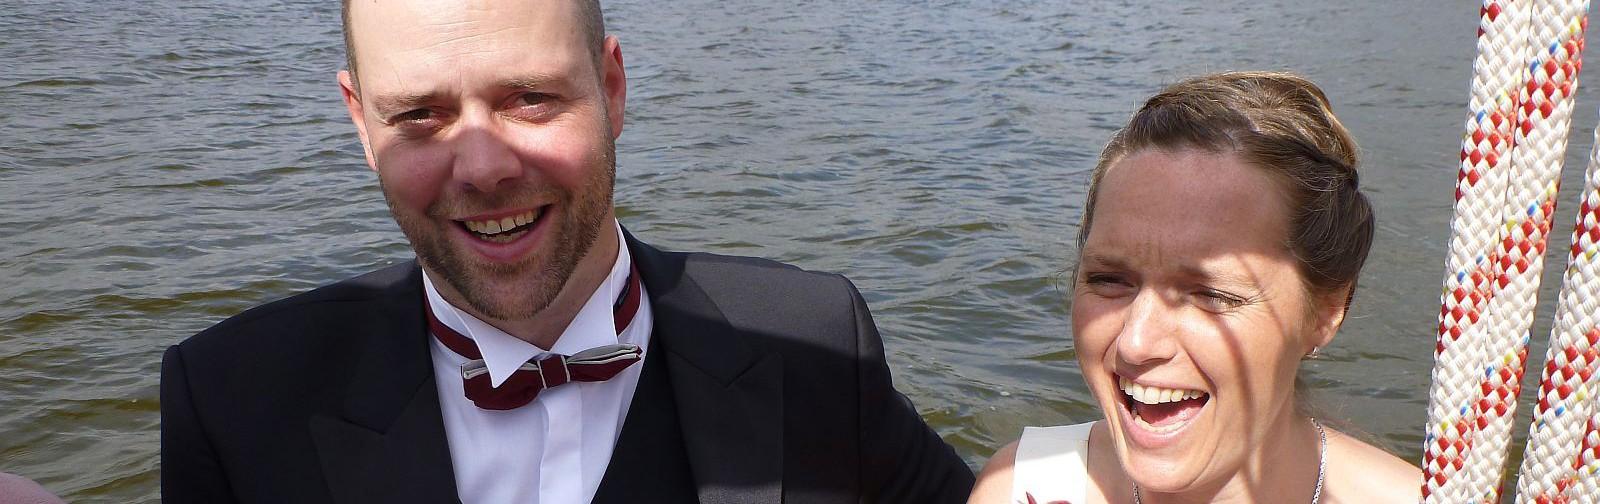 just married – Oli und Claudia Bloch 8.9.2012